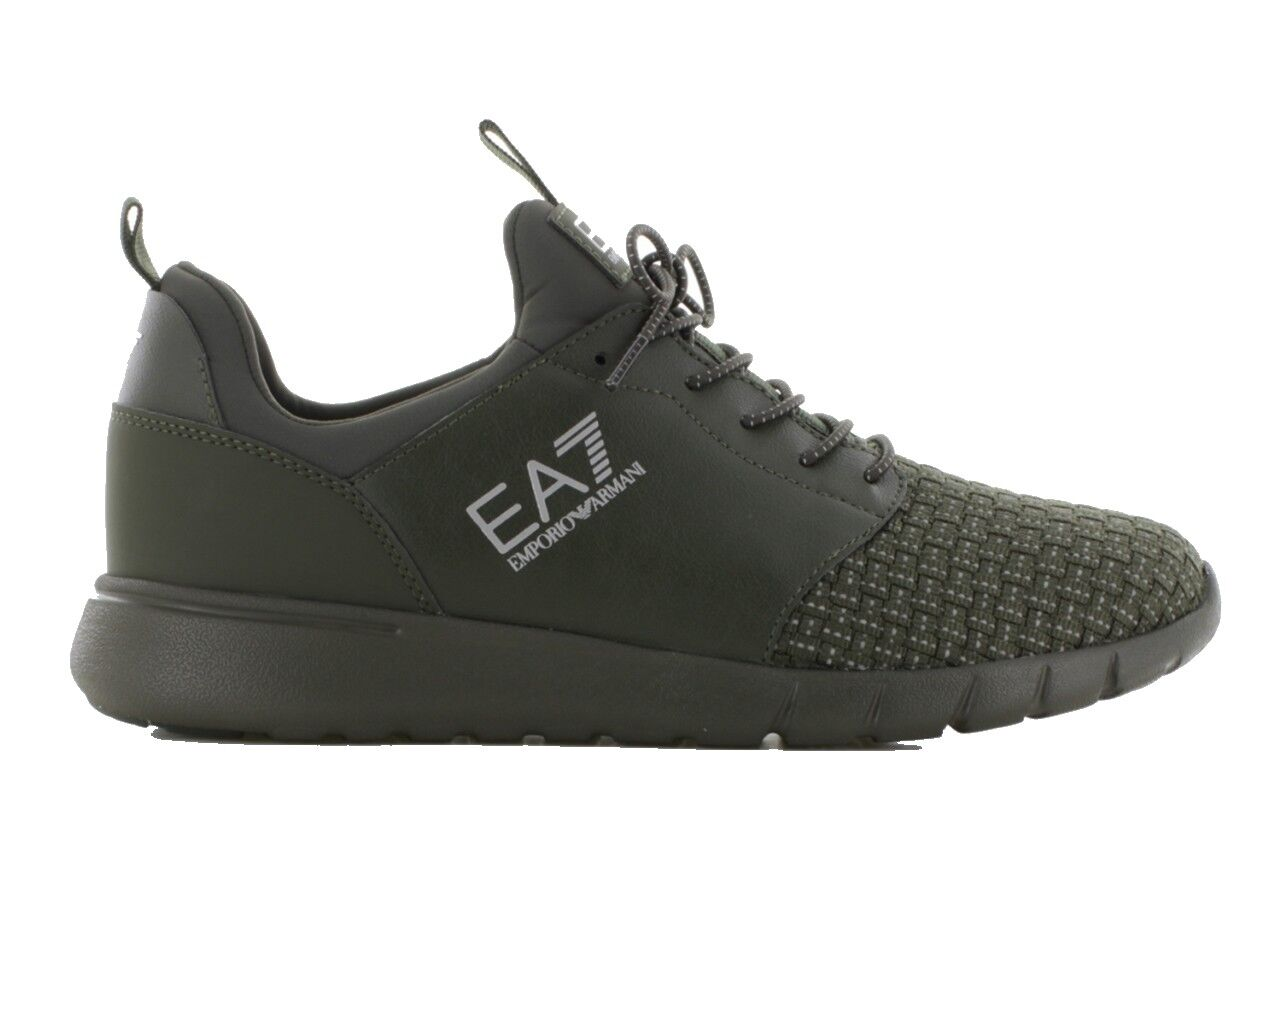 Offerta Emporio Armani 248054 8P299 Semplice Racer Intrecciato EA7 shoes